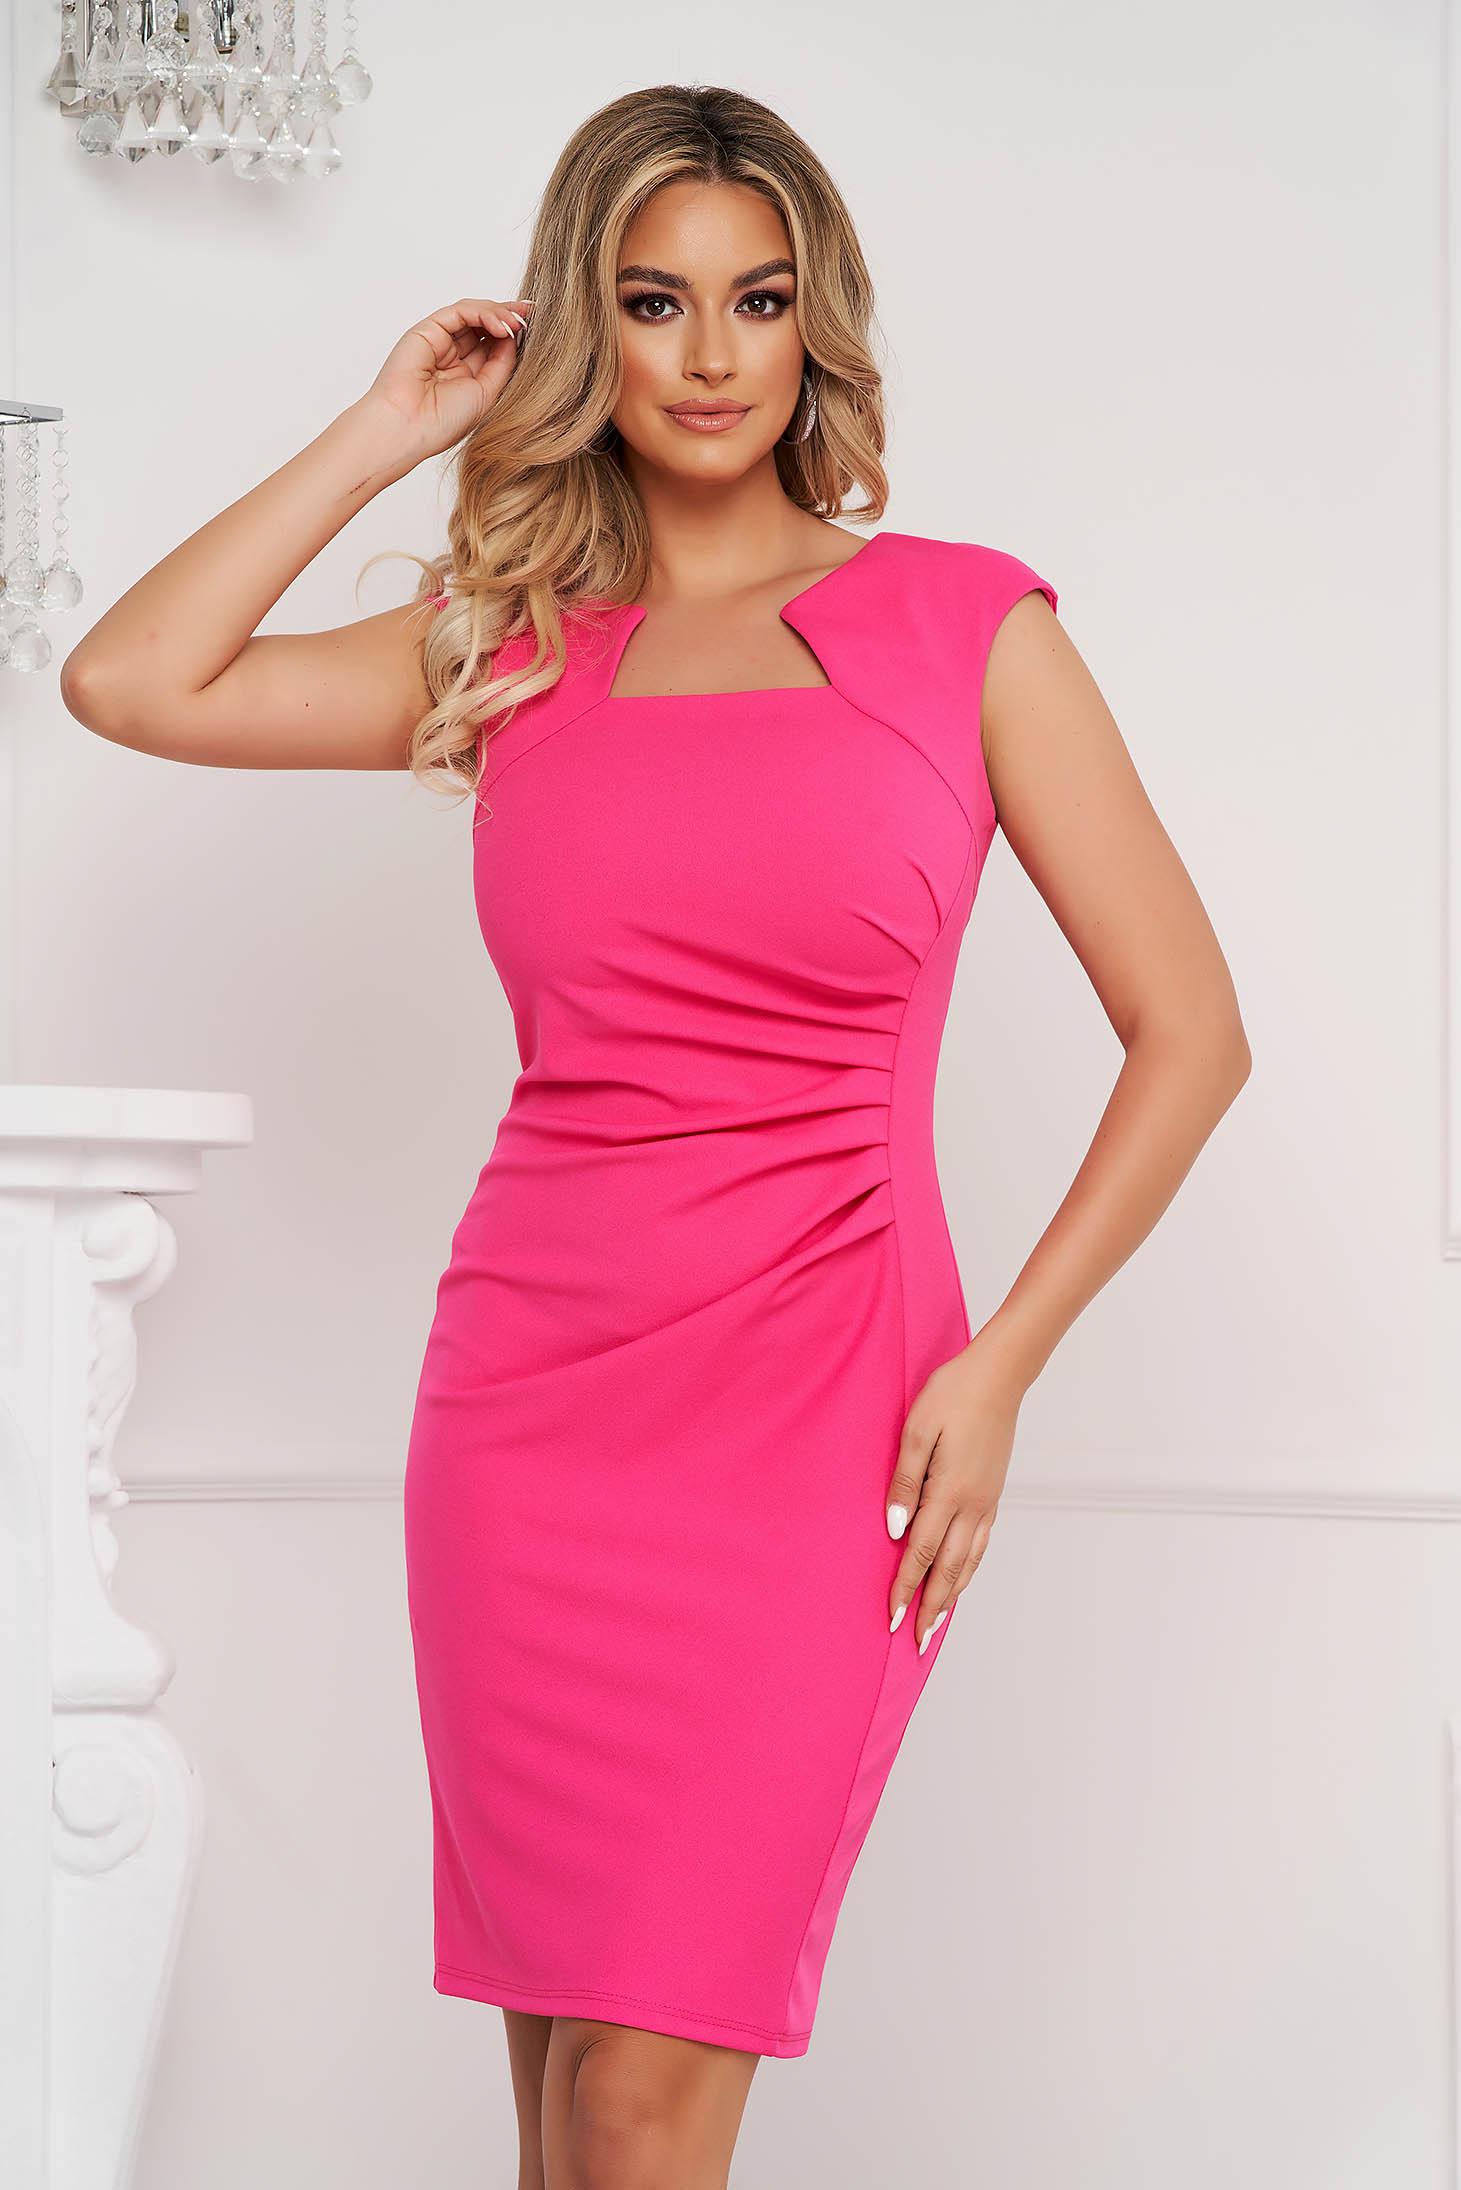 Pink dress office short cut pencil from elastic fabric short sleeves